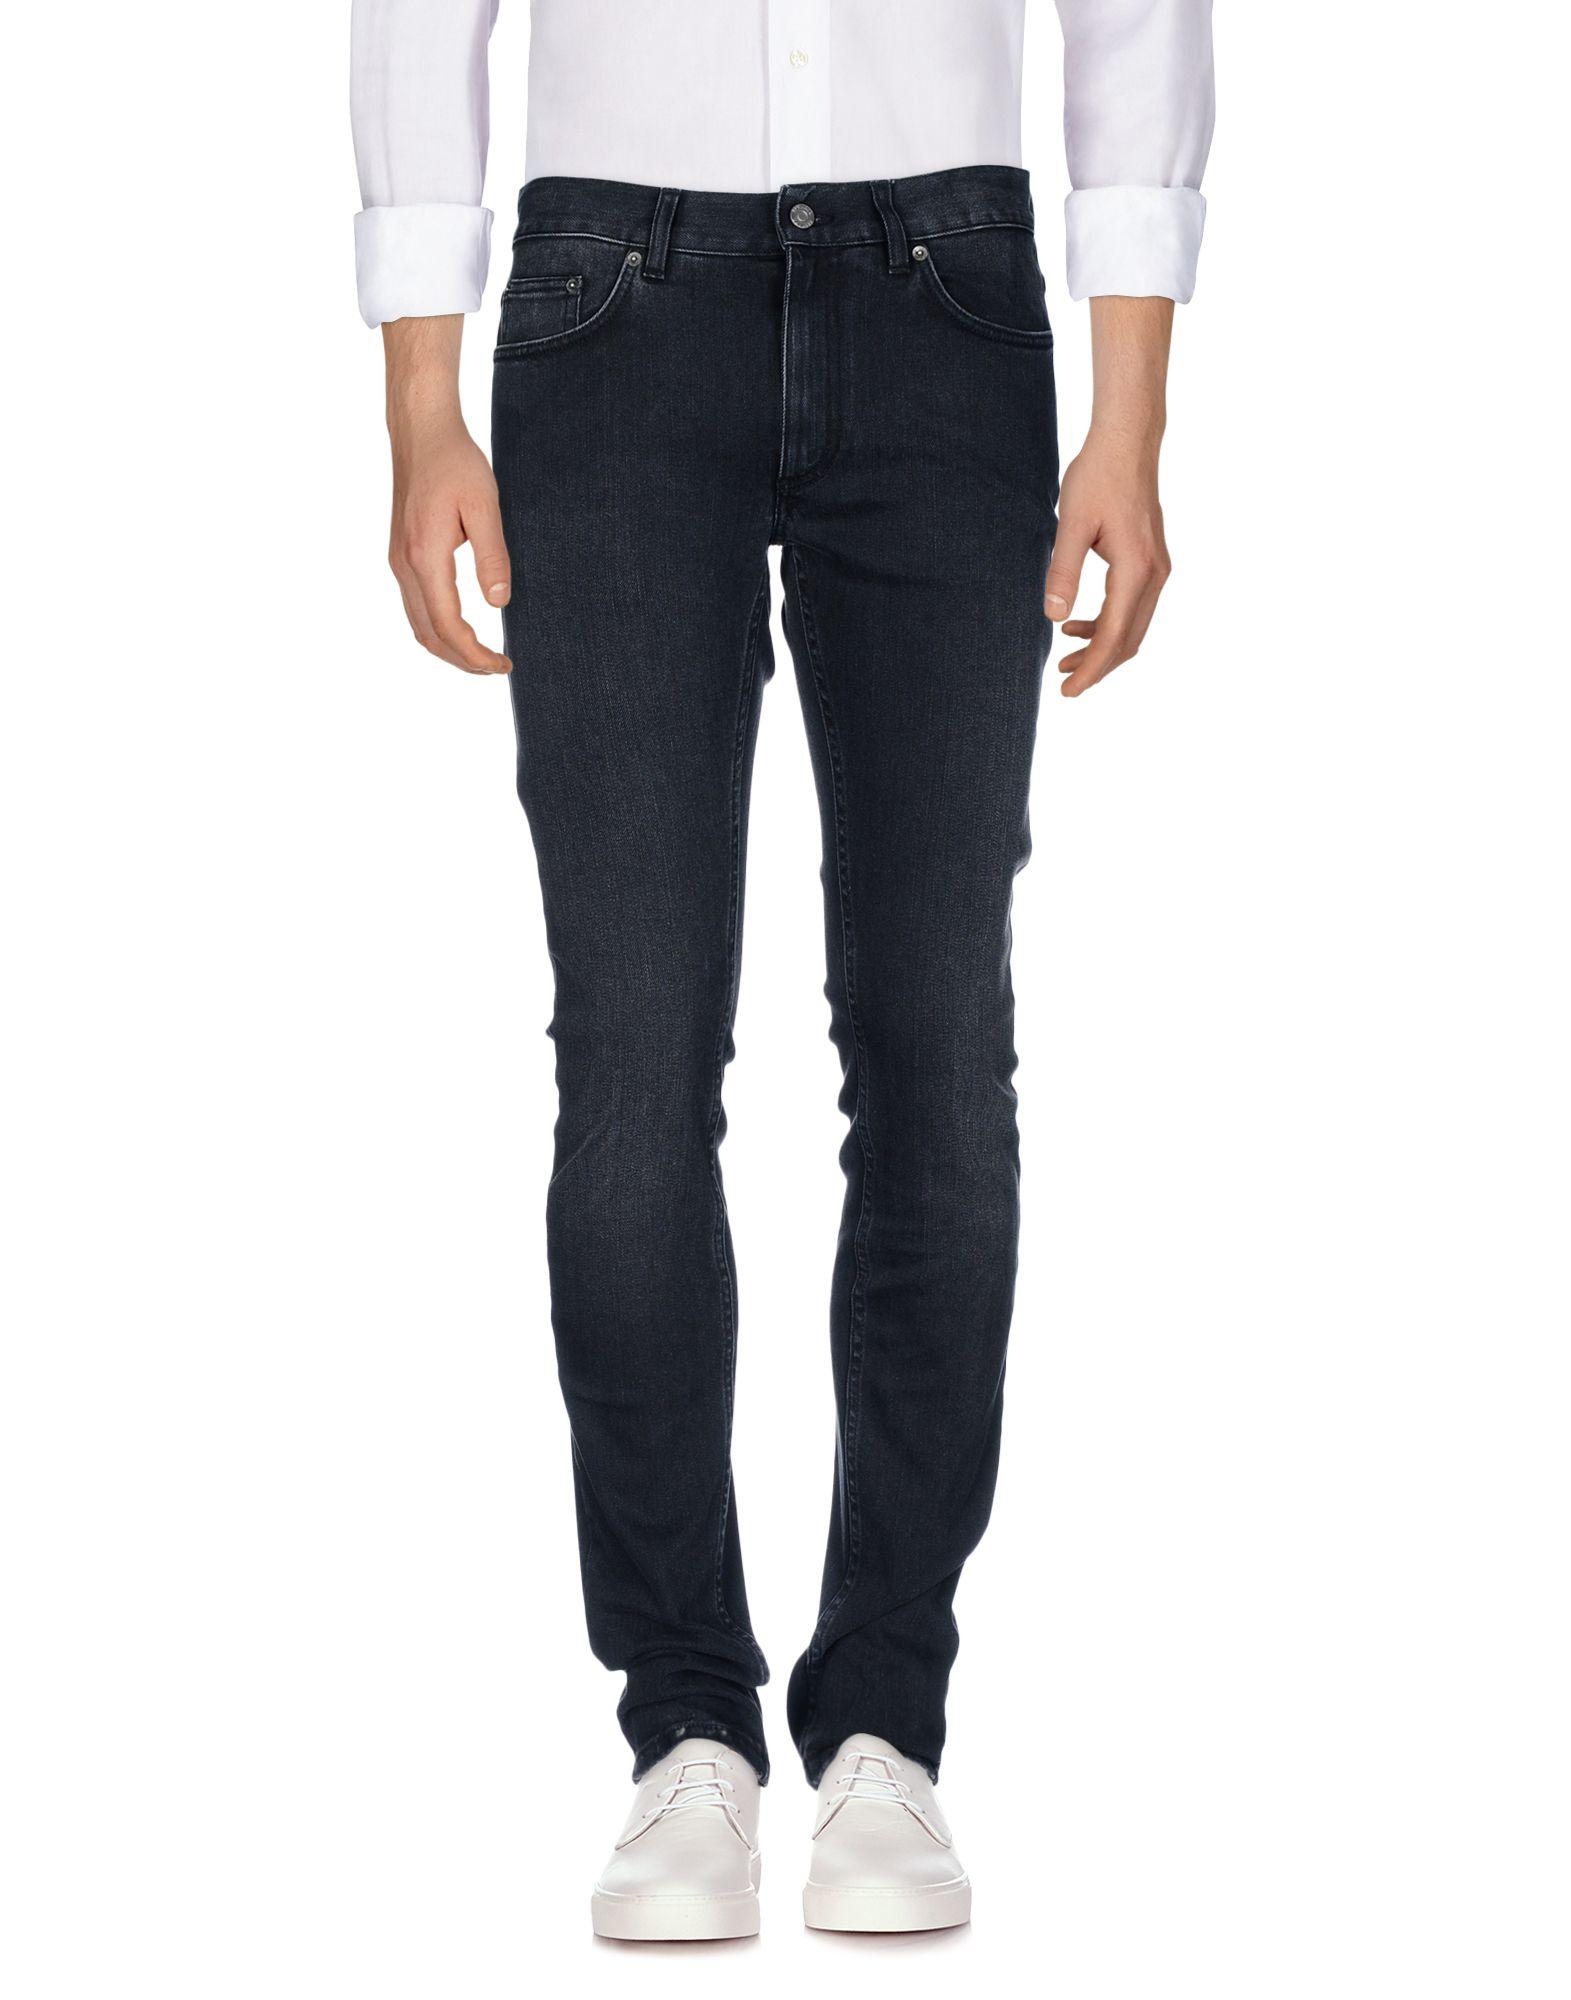 Pantaloni Jeans Roberto Cavalli Uomo - Acquista online su